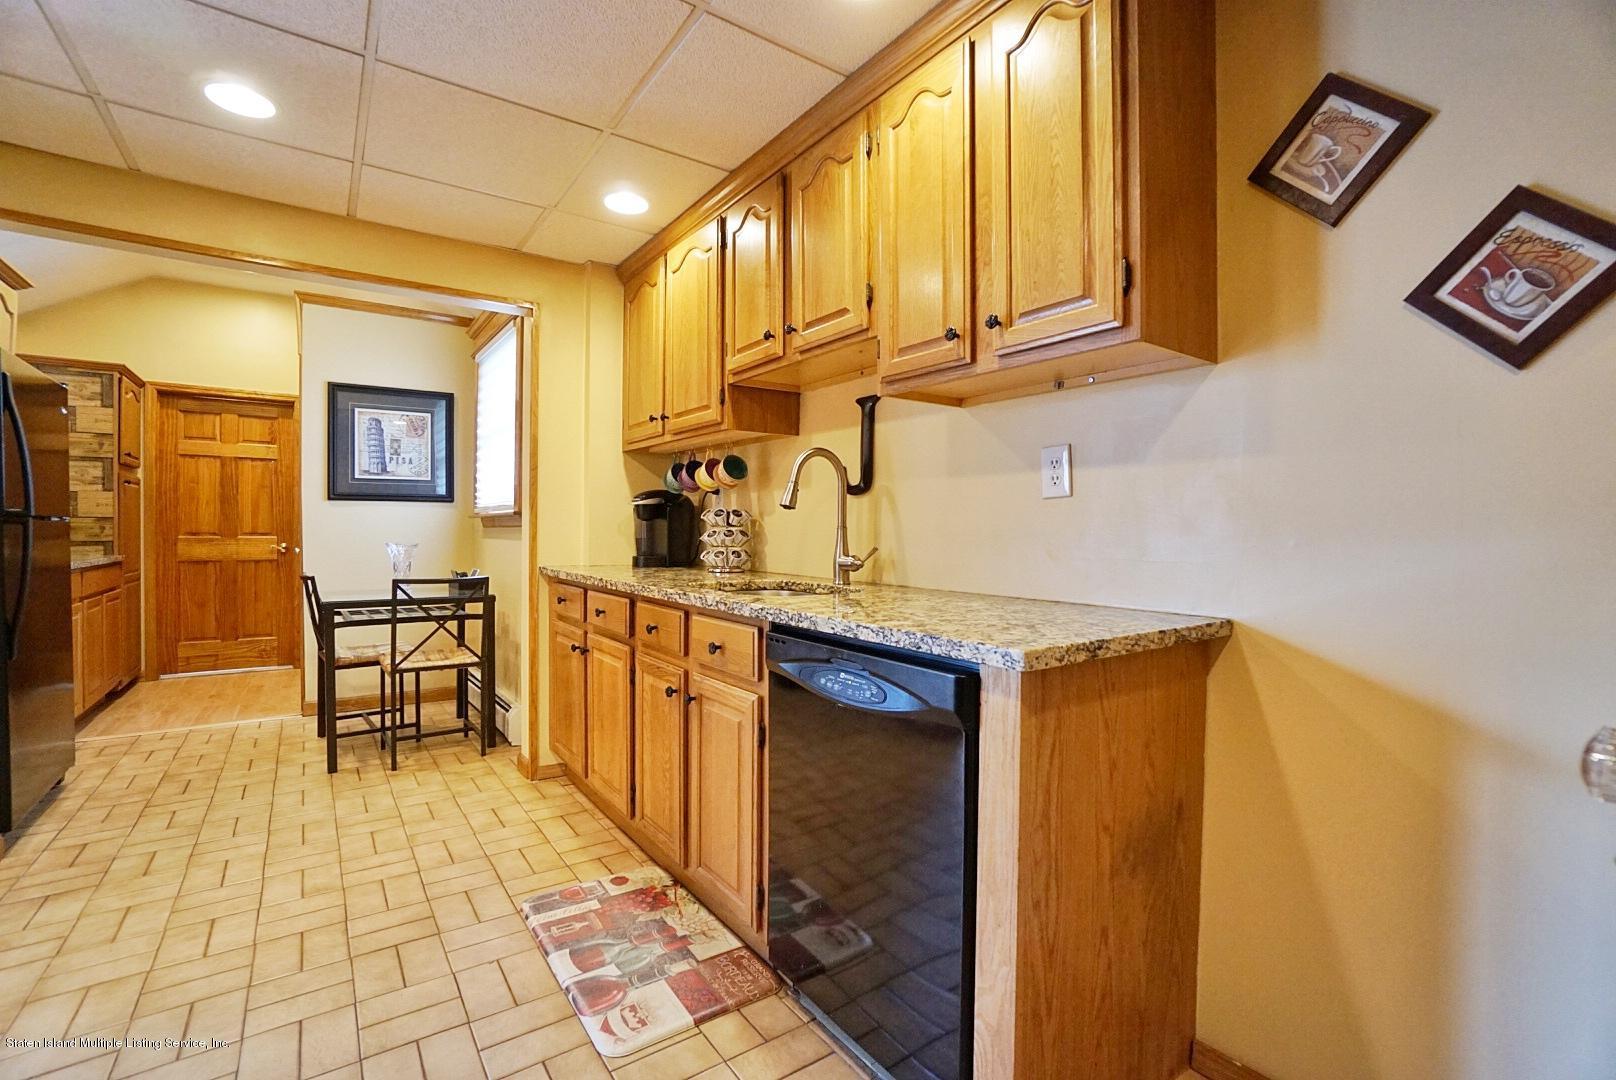 Single Family - Detached 22 Maine Avenue  Staten Island, NY 10314, MLS-1128323-9